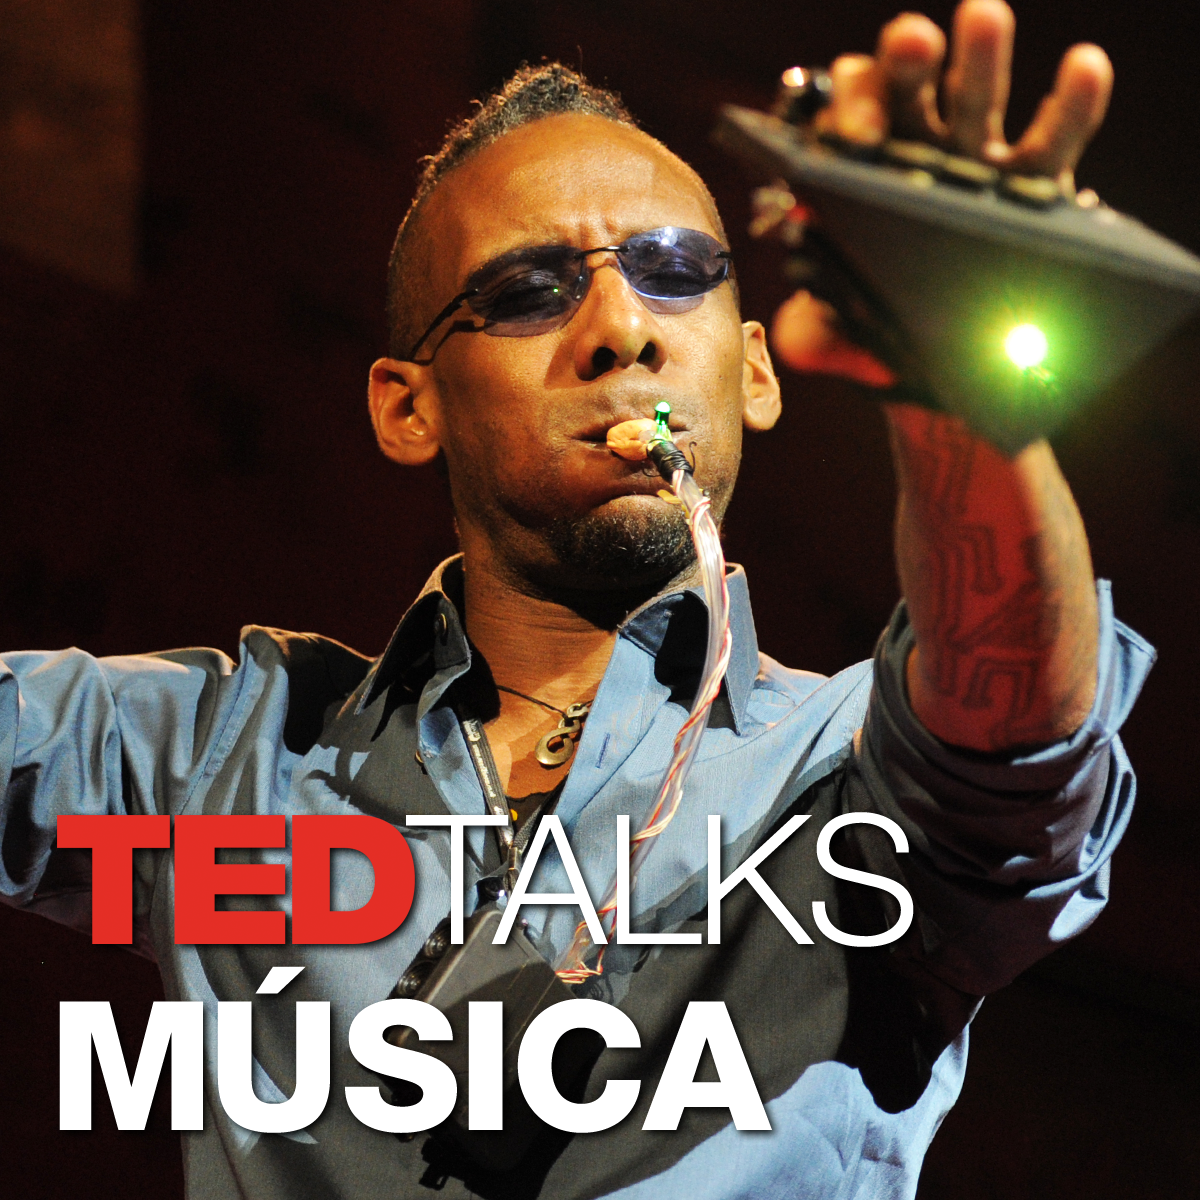 TEDTalks Música